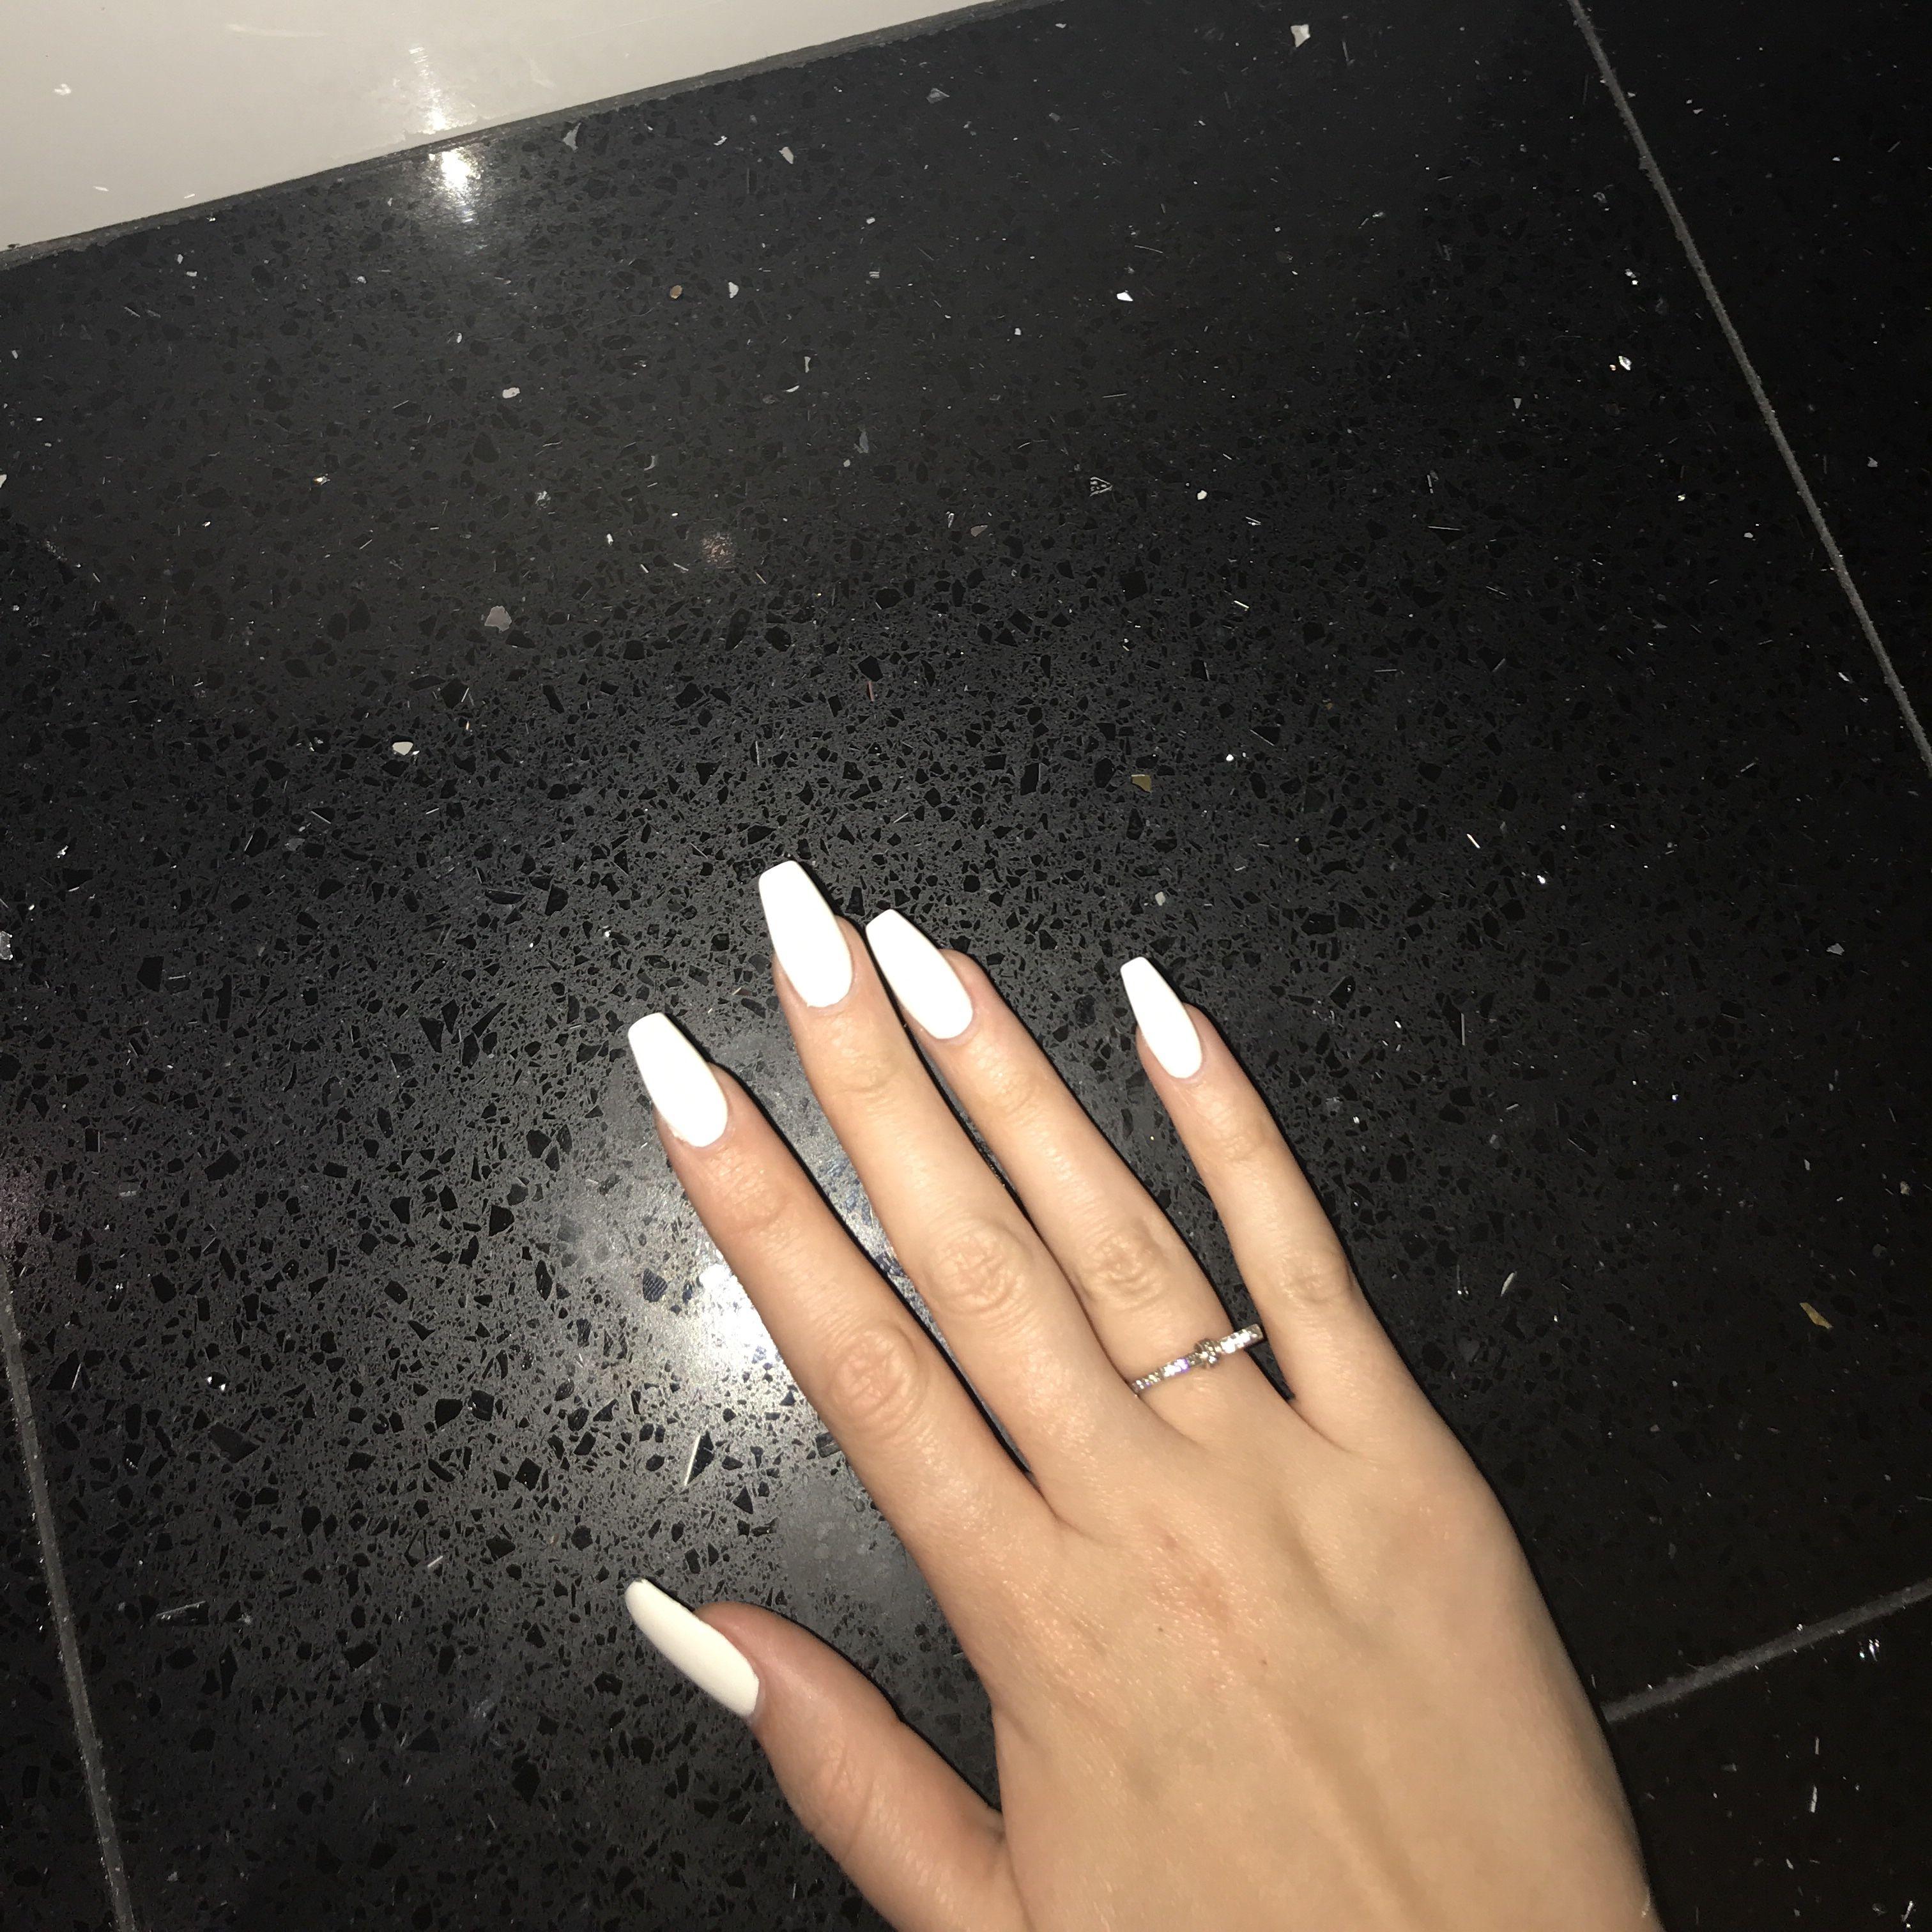 Long White Coffin Nails Claws White Acrylic Nails Nail Shapes Cute Nails